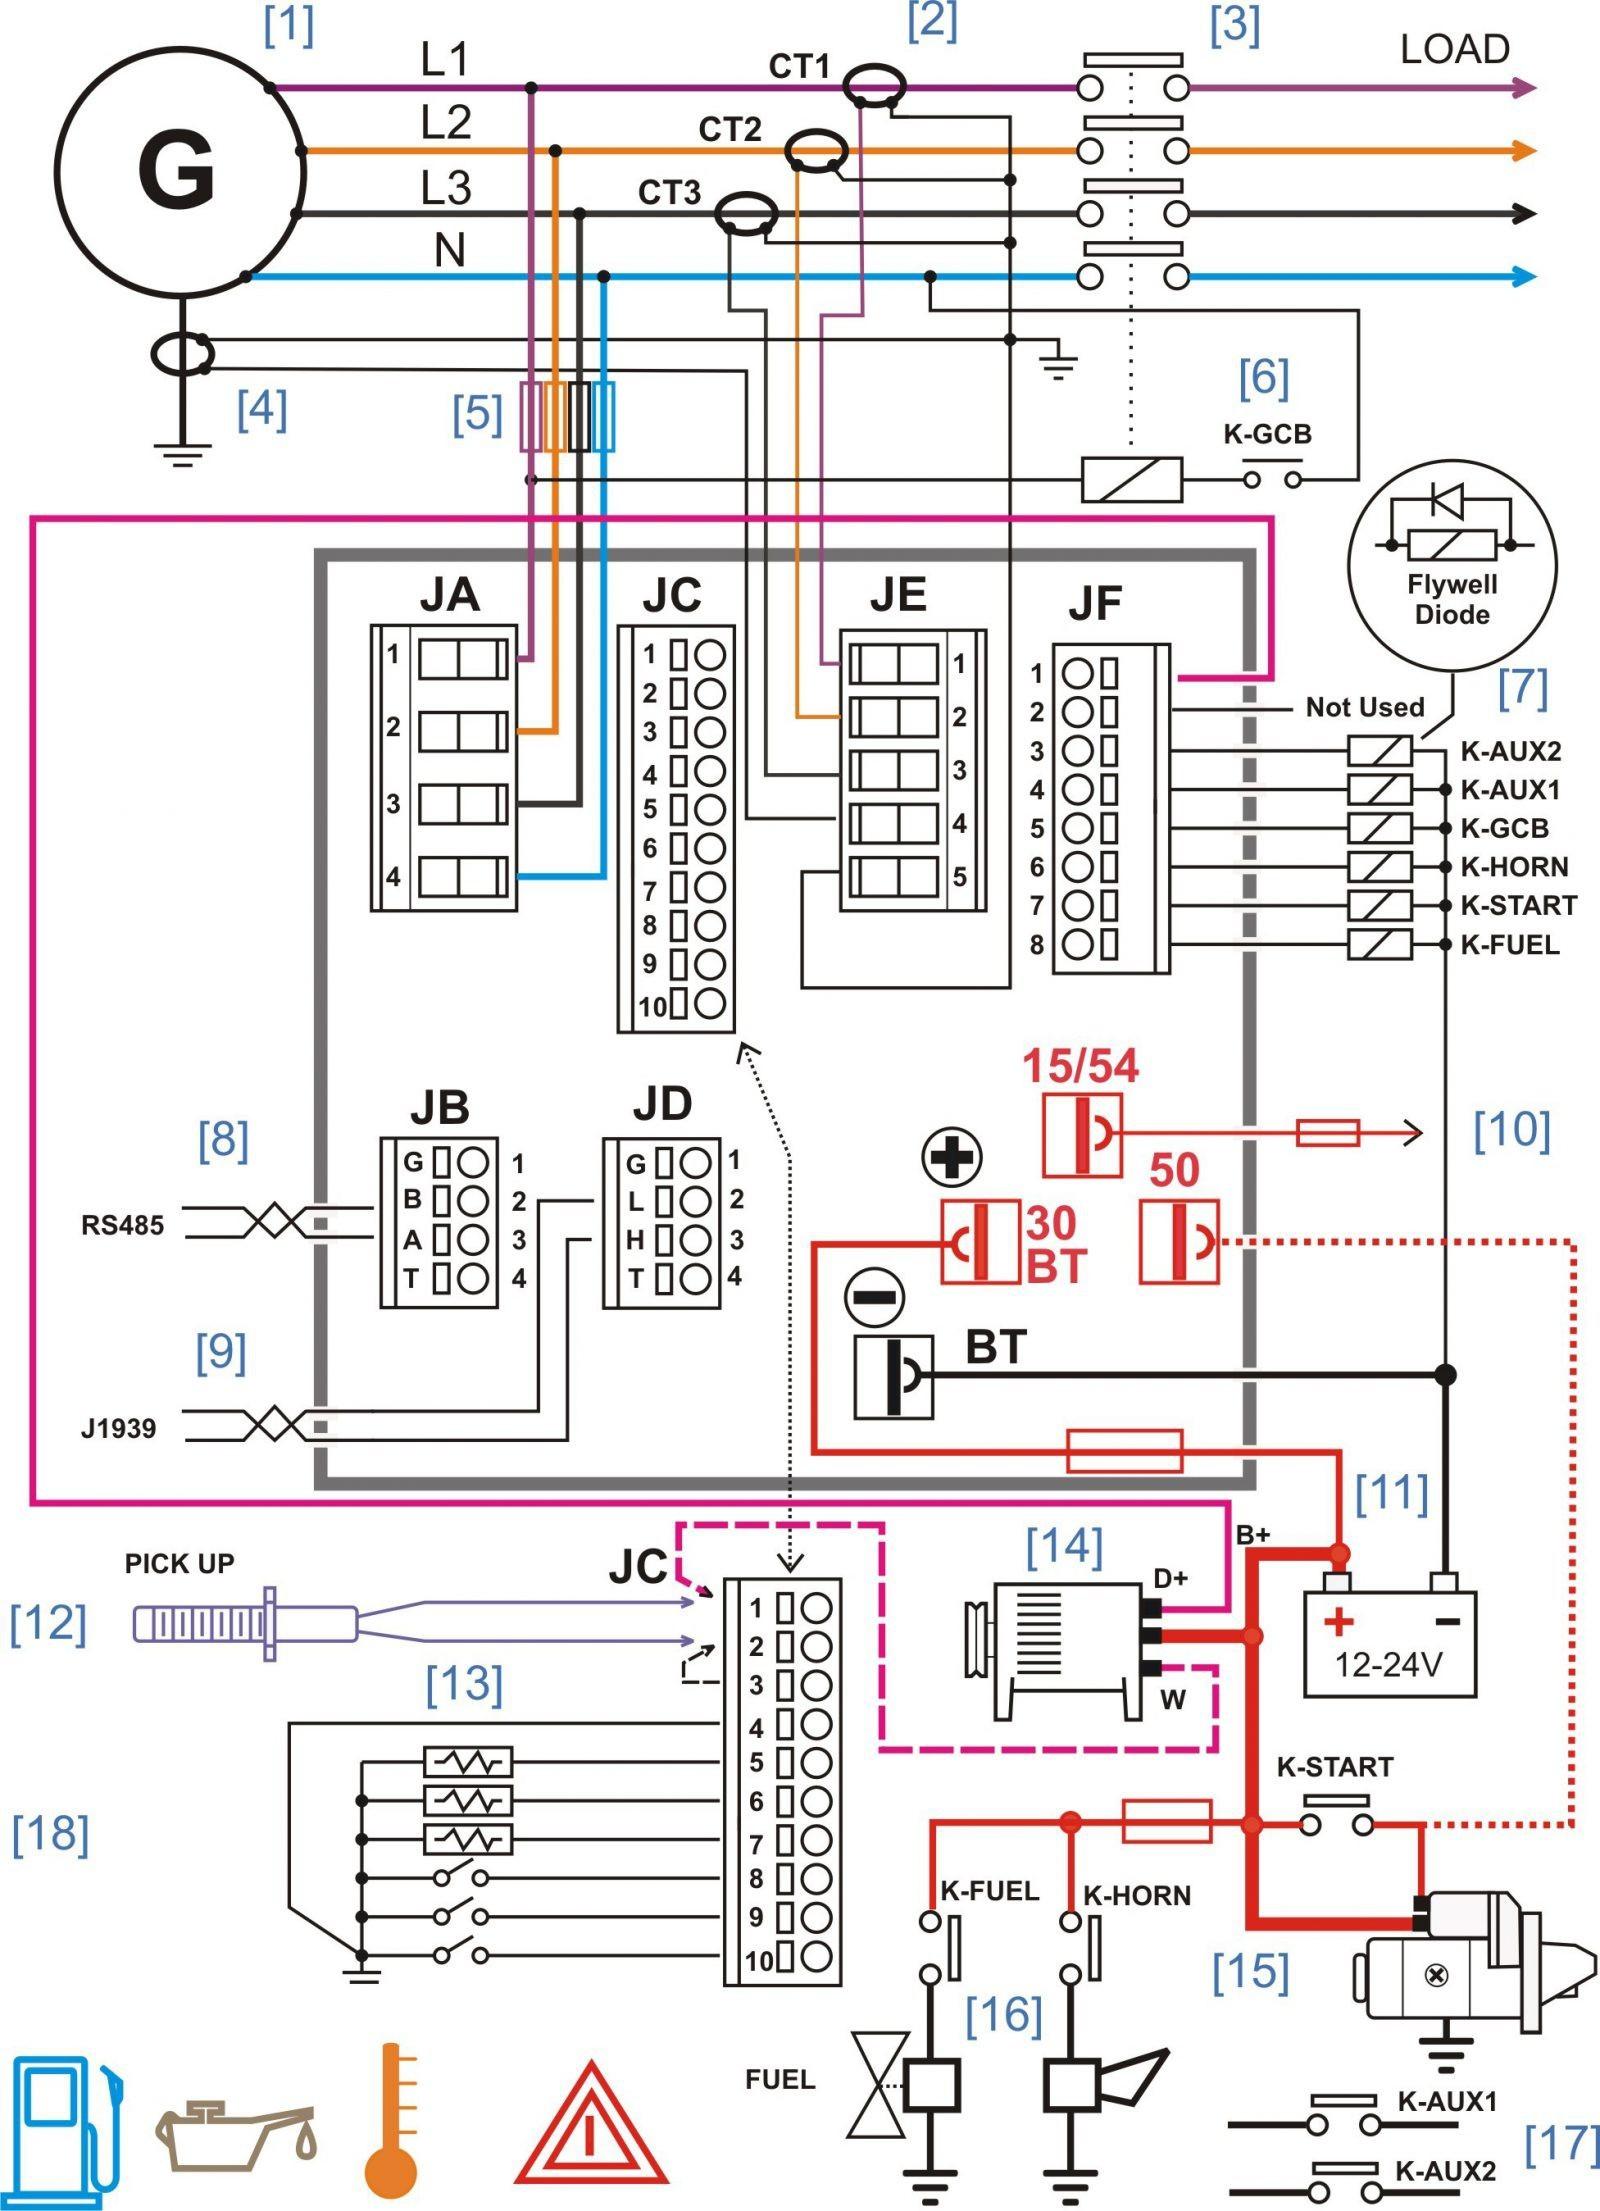 Kenwood Radio Wiring Diagram Lovely Car Stereo Wiring Diagram Diagram Of Kenwood Radio Wiring Diagram